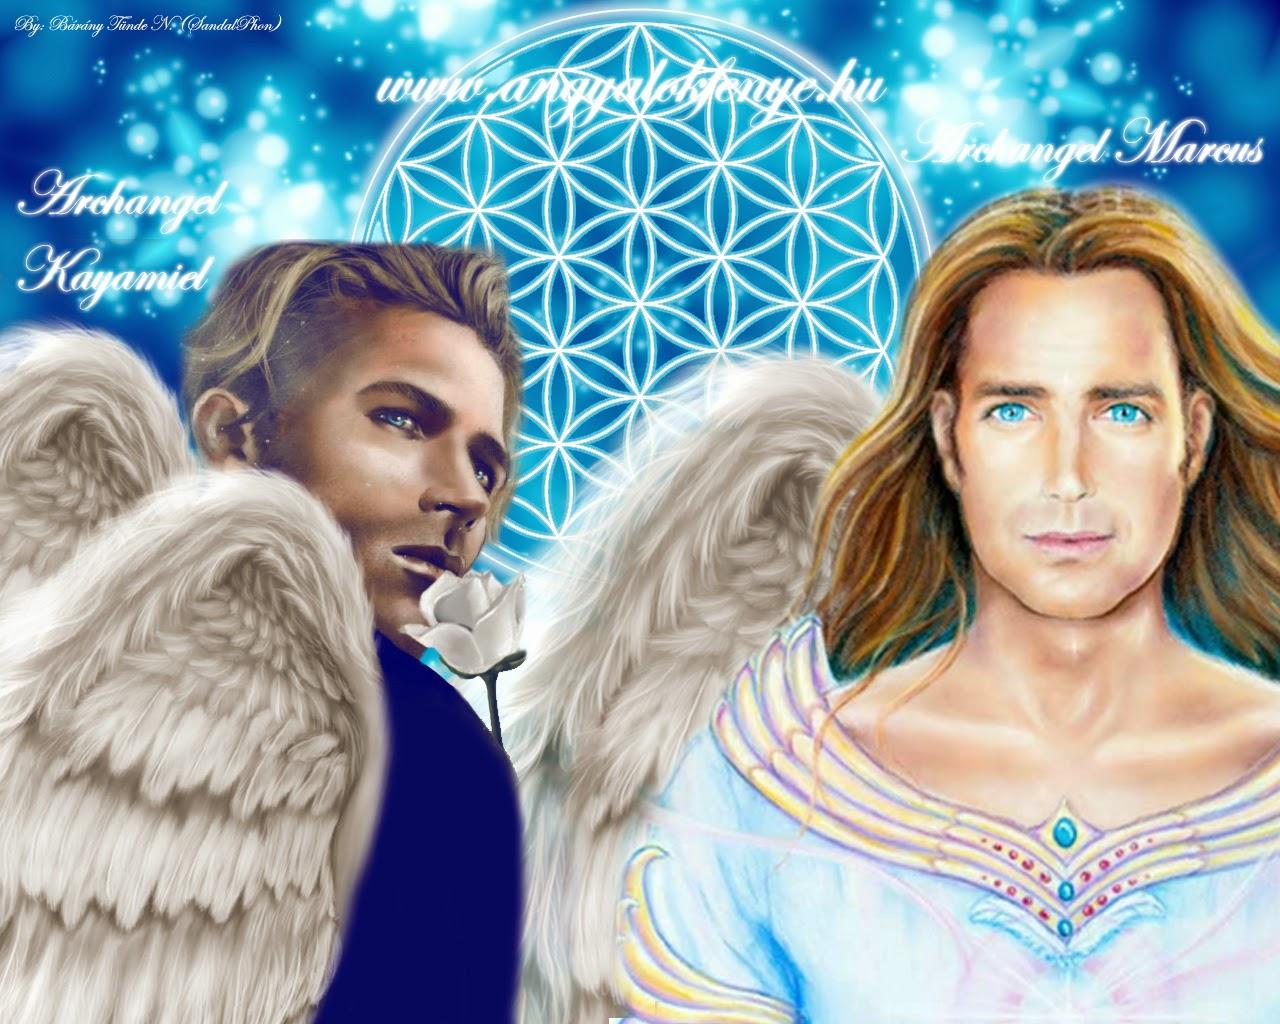 Marcus-Kayamiel-angyalok fénye